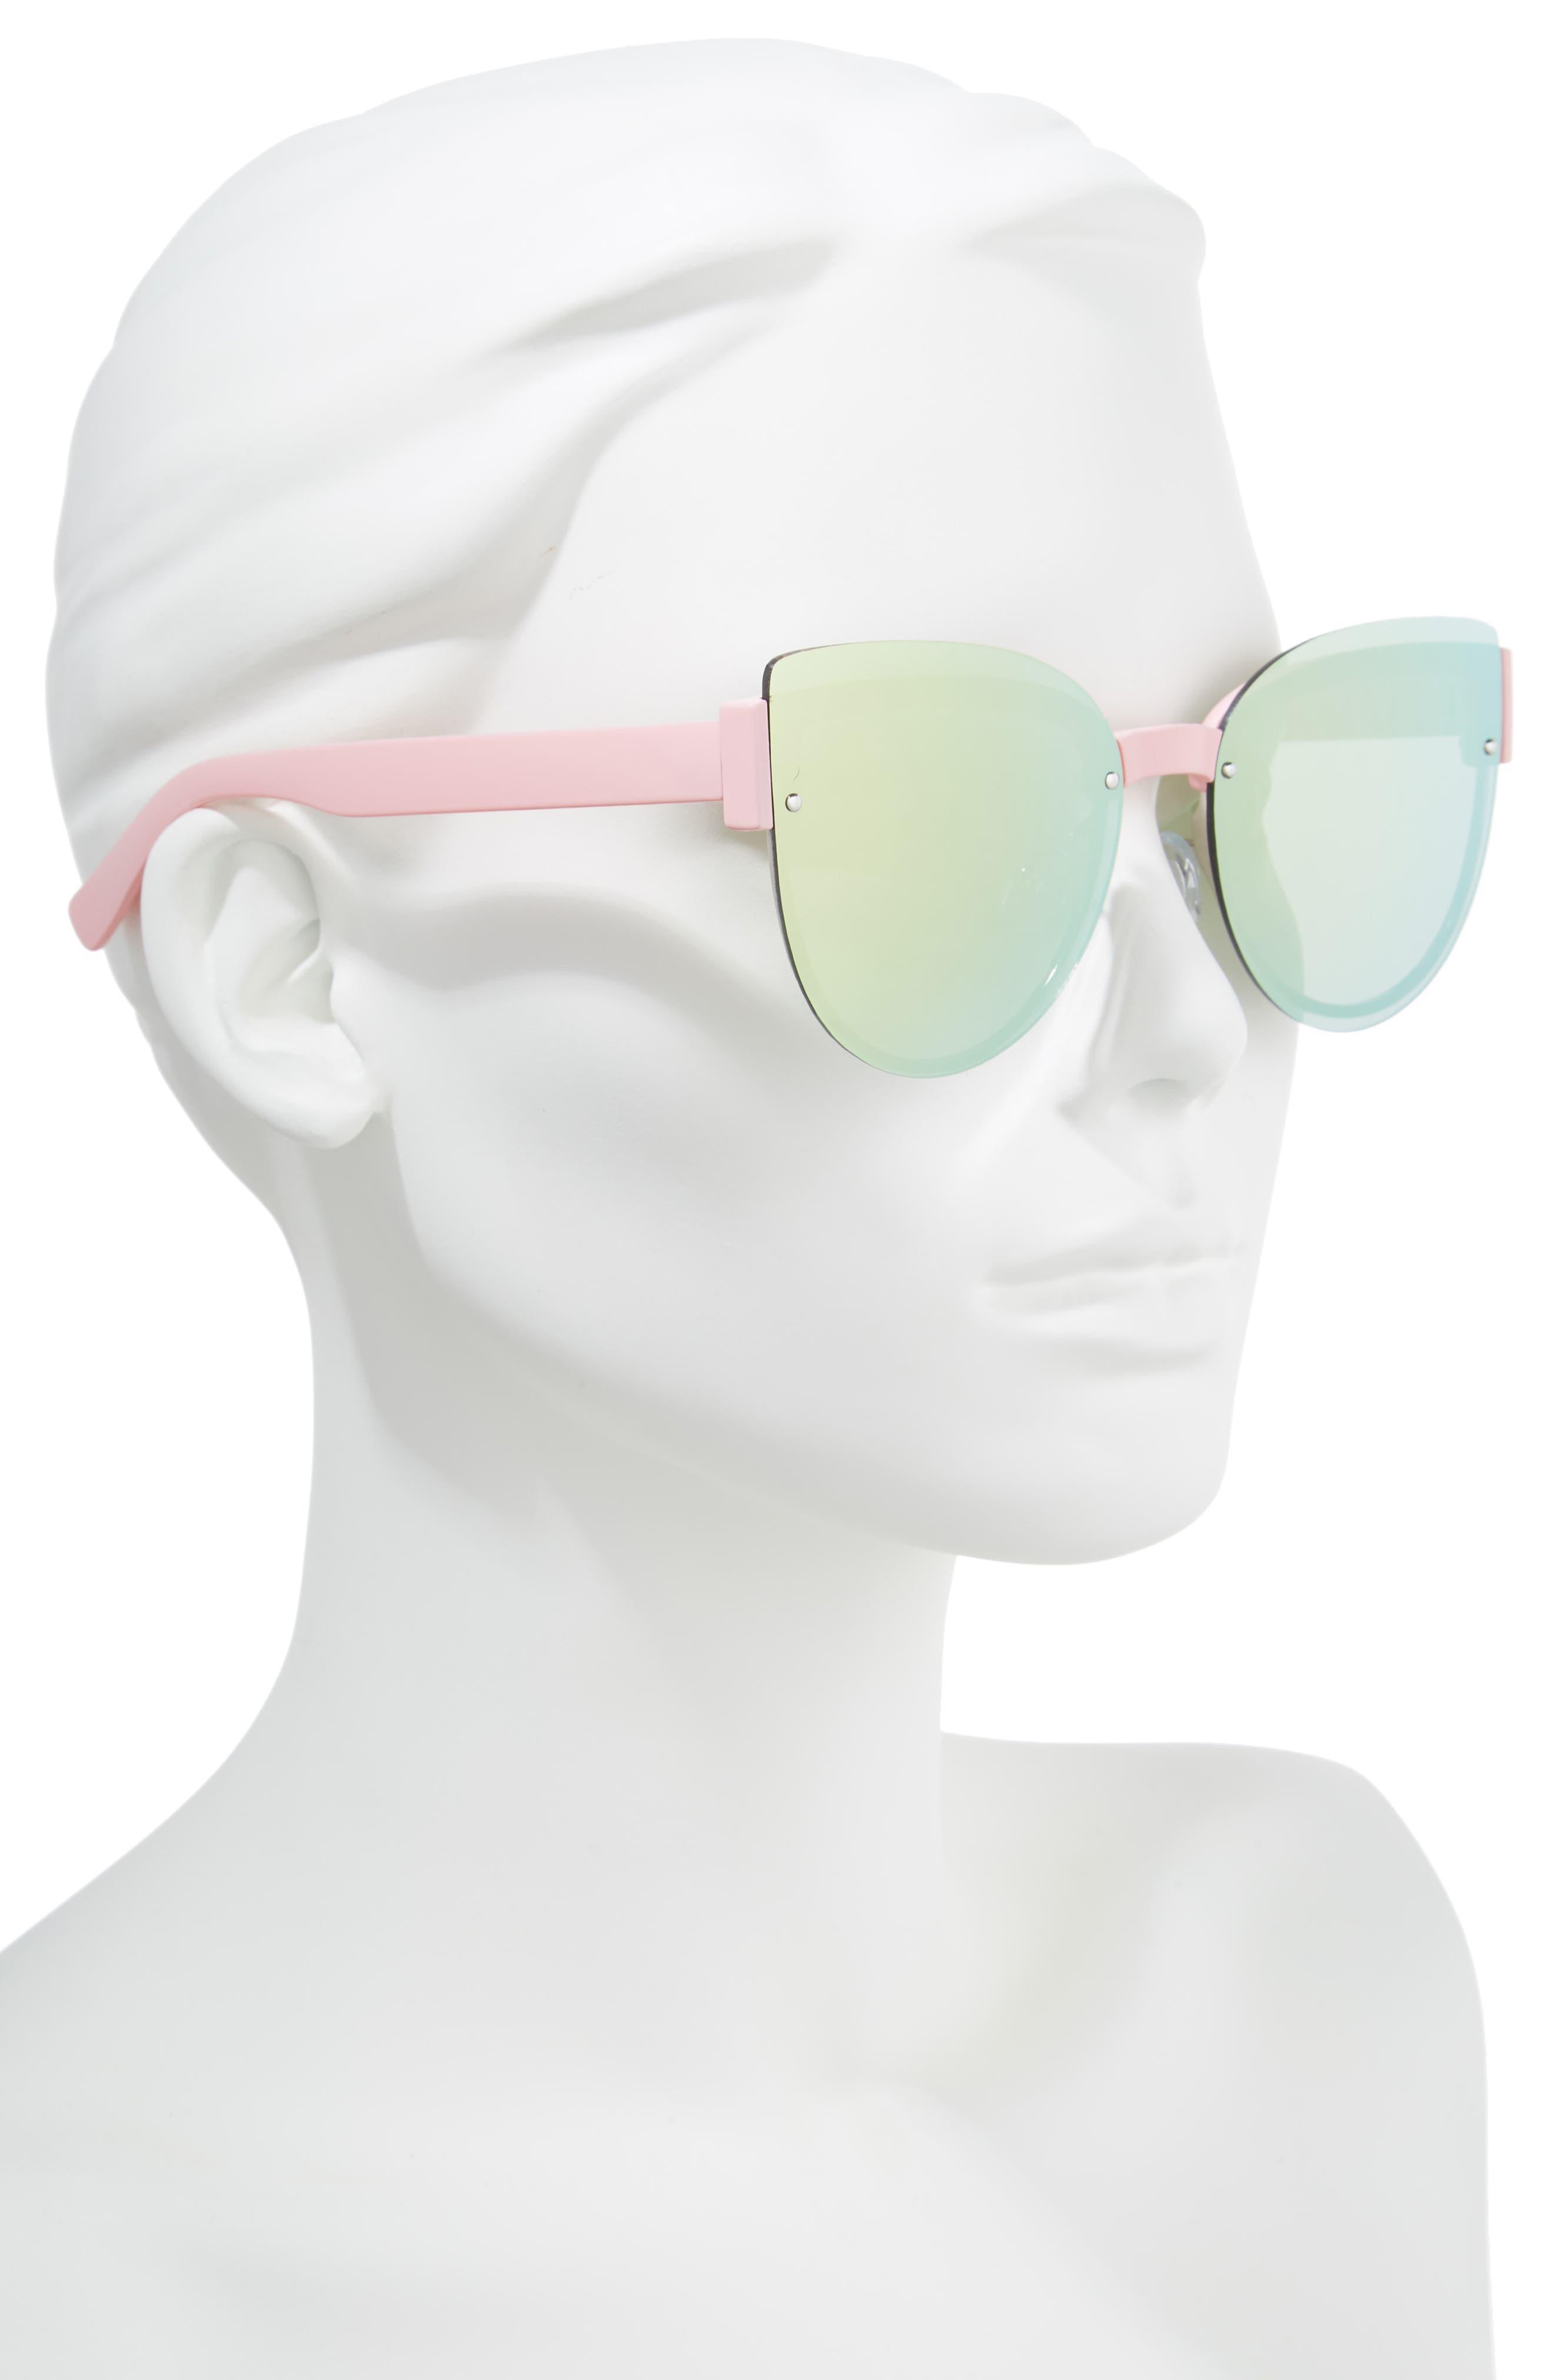 62mm Oversize Rimless Cat Eye Sunglasses,                             Alternate thumbnail 2, color,                             Pink